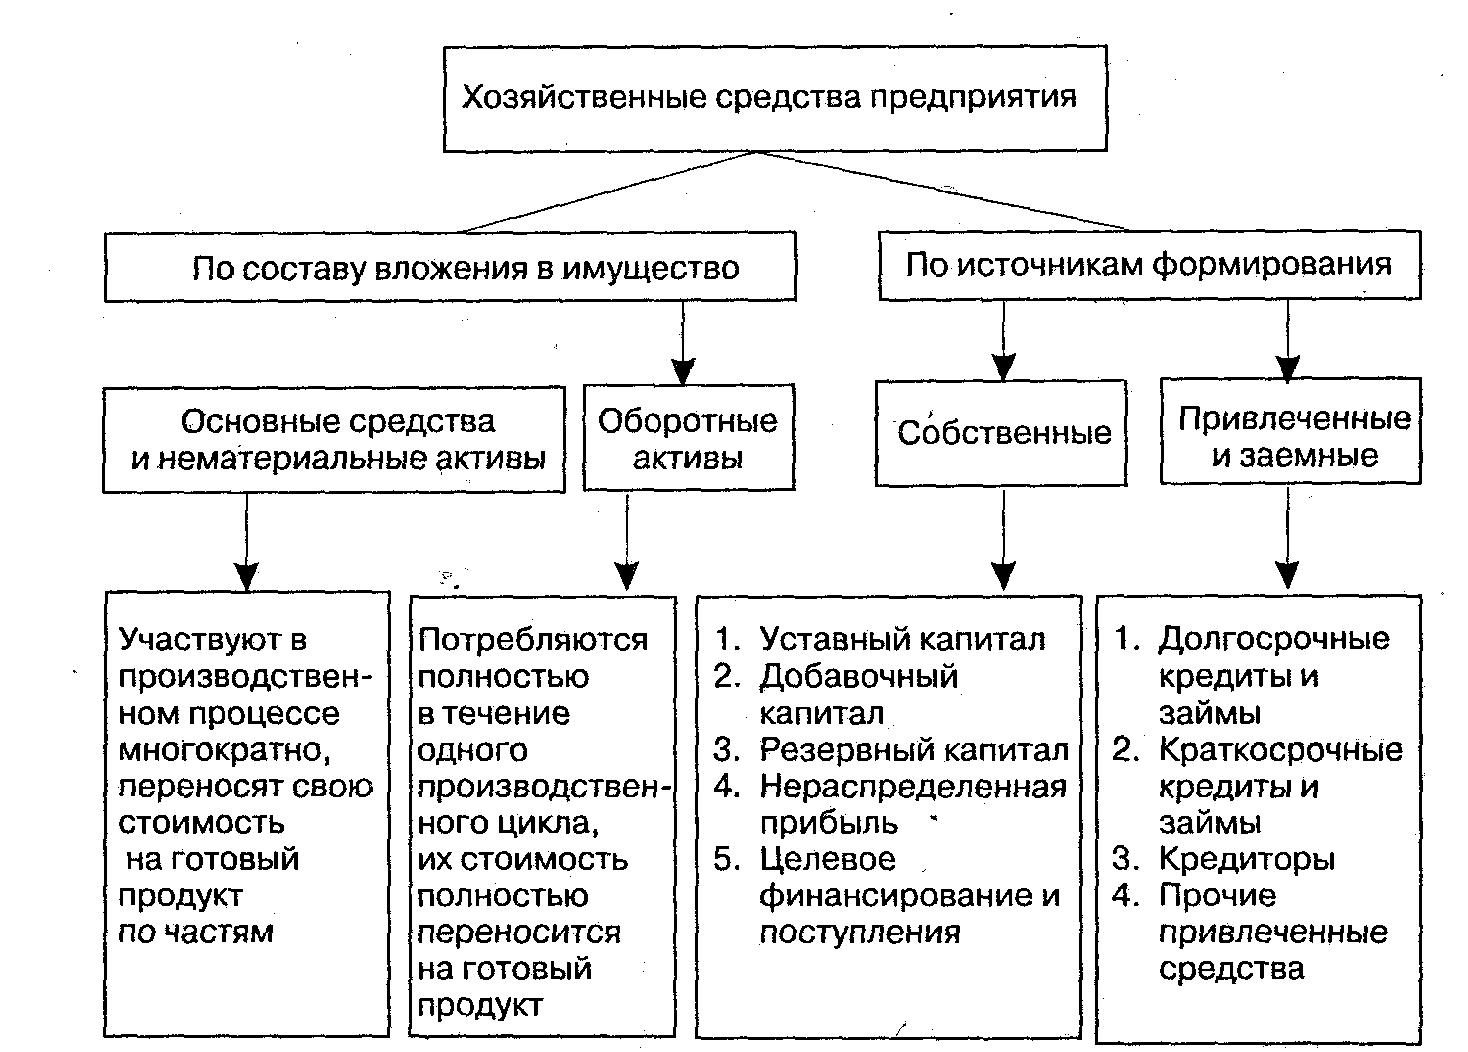 Классификация хозяйственных средств в предприятии шпаргалка